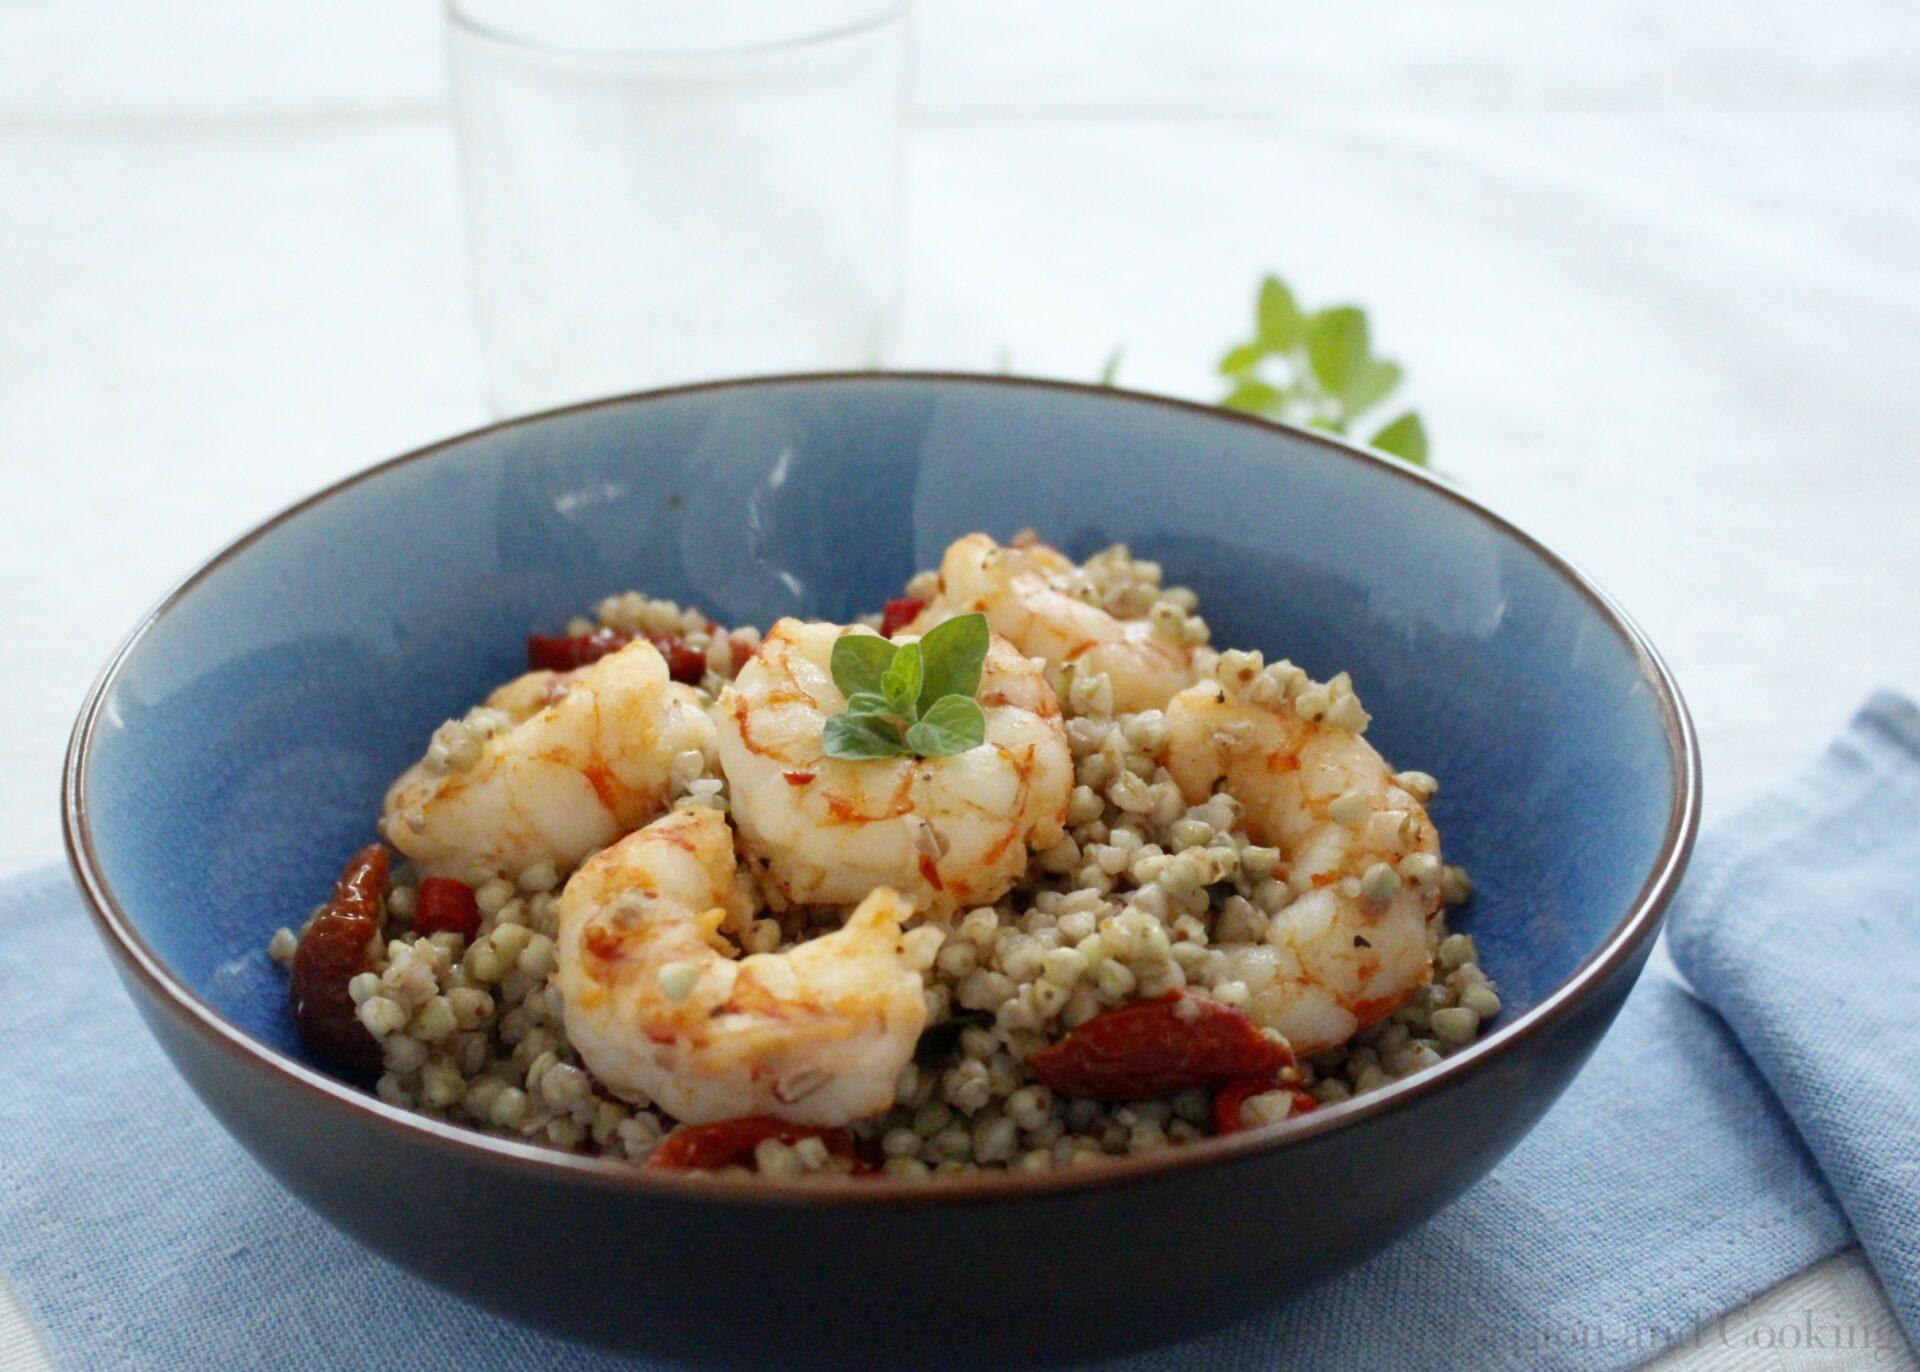 Buckwheat salad with prawns